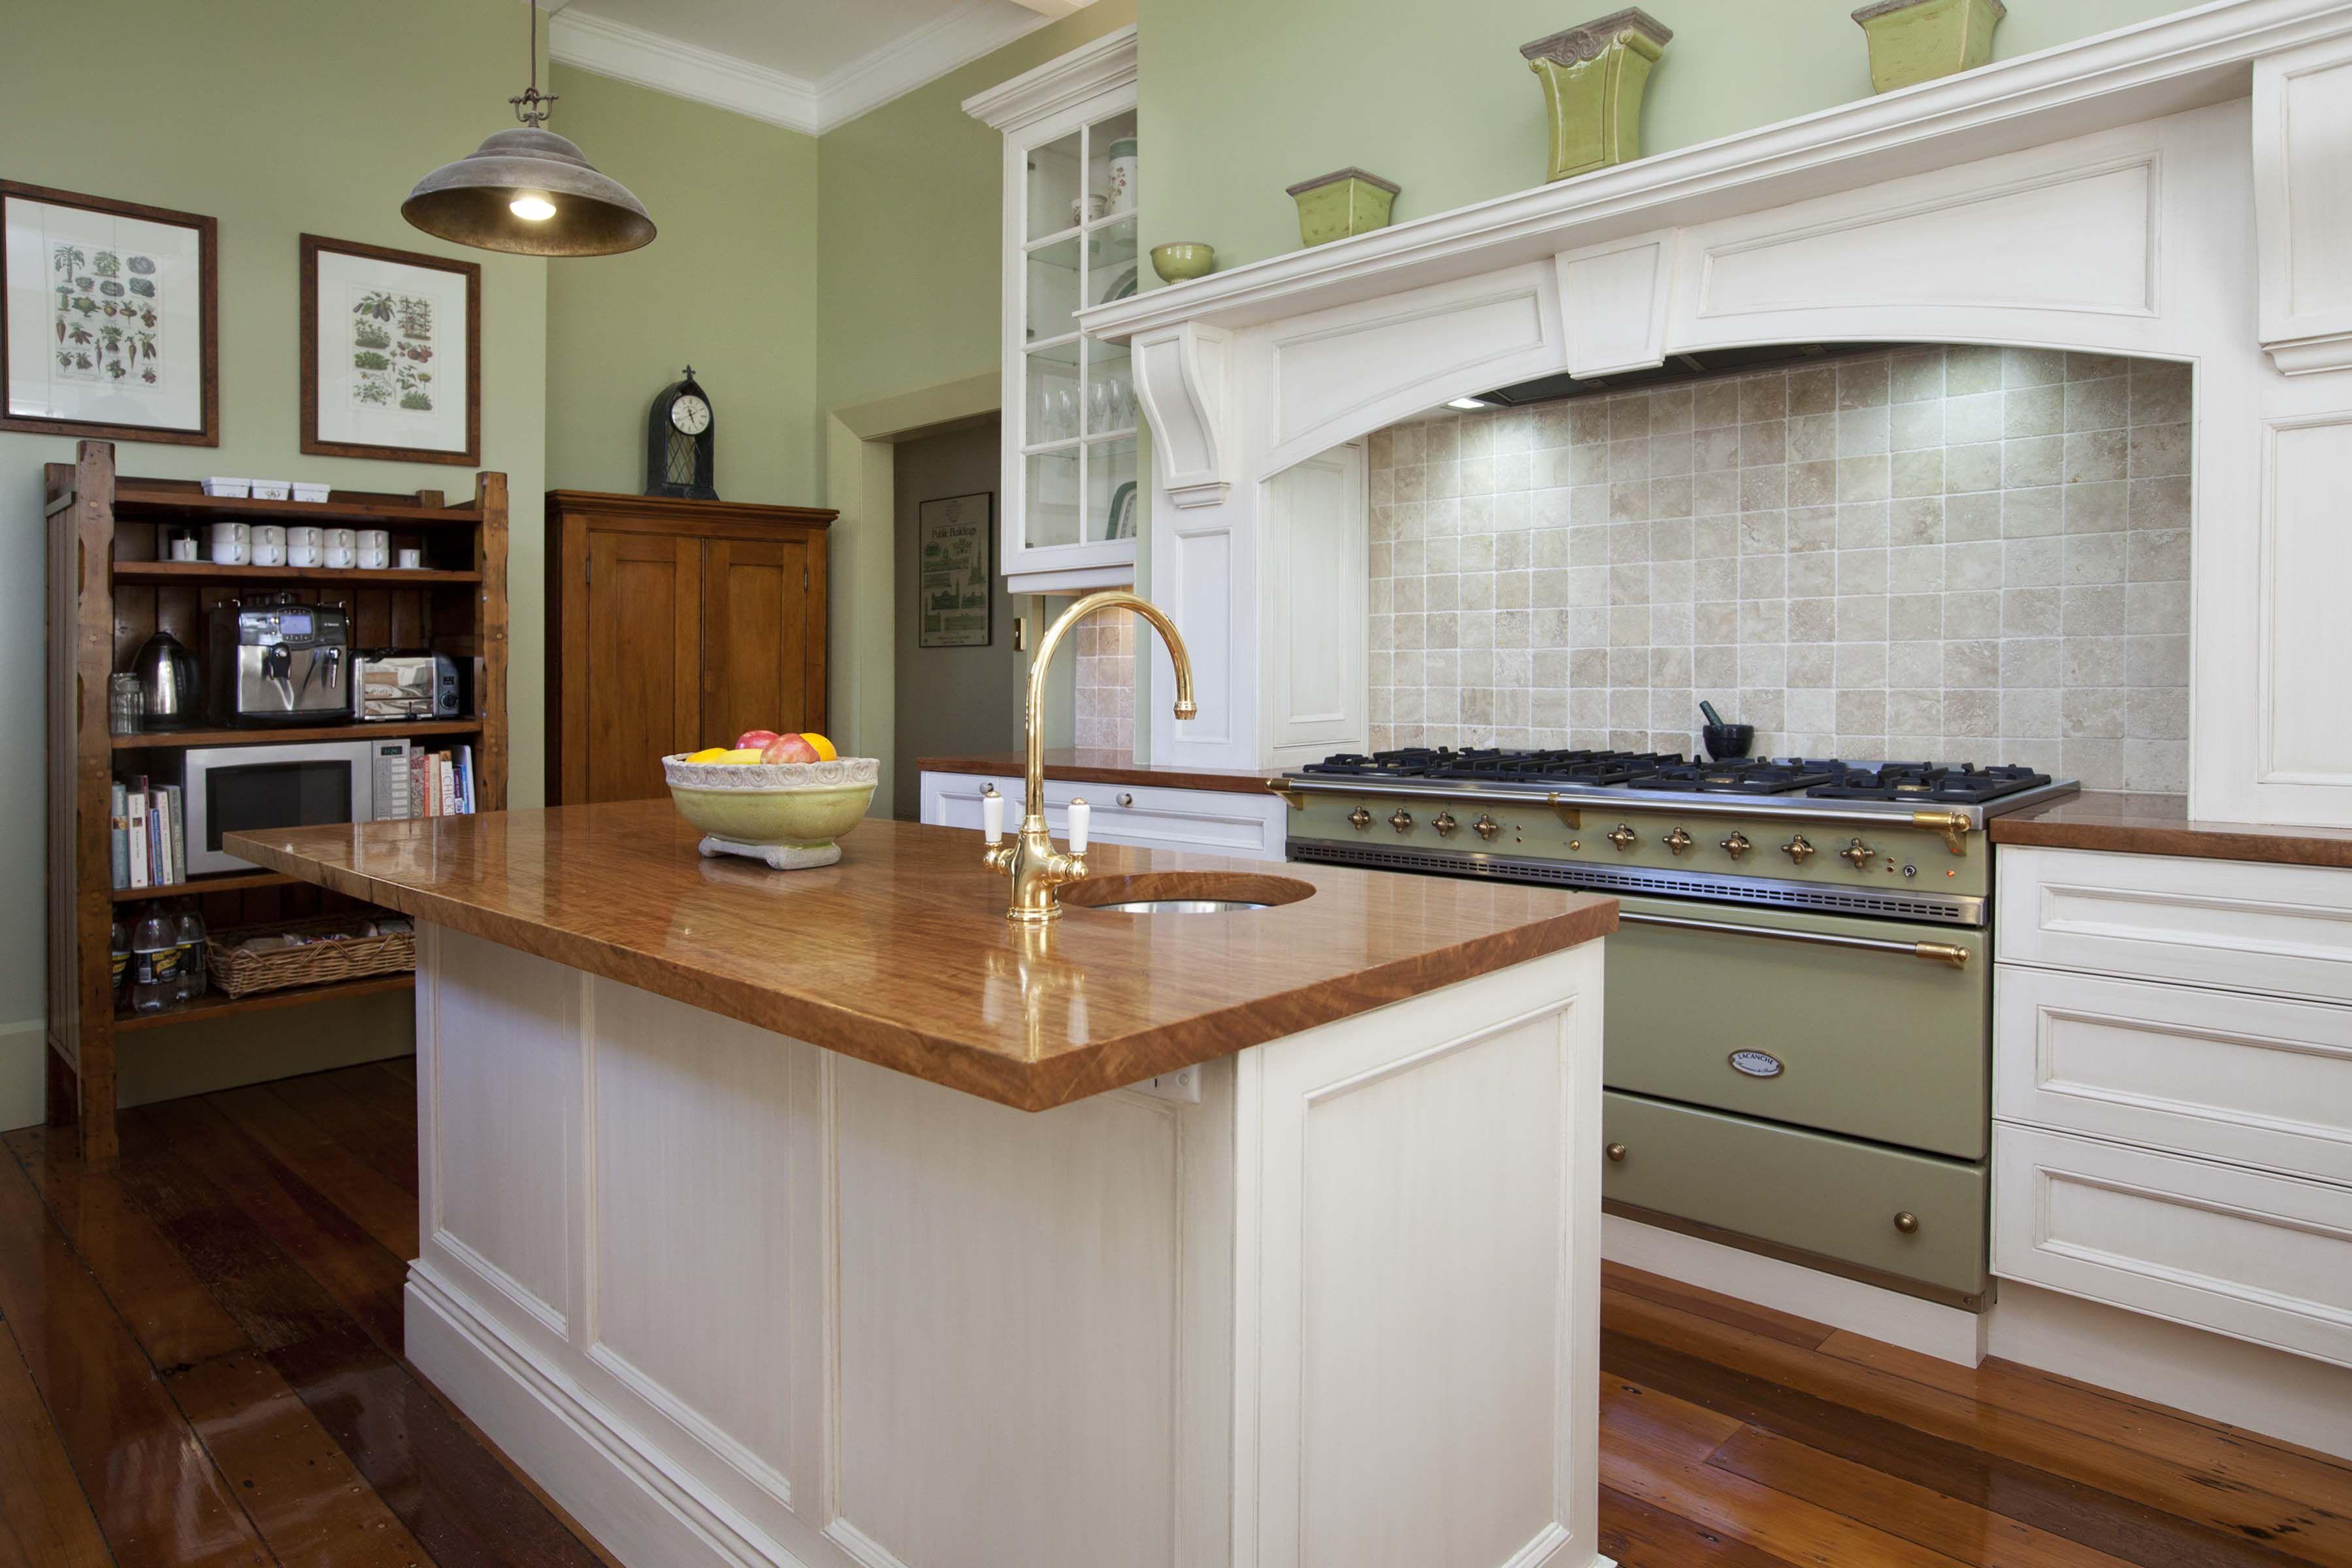 South Yarra Provincial kitchen Kitchen places, Kitchen